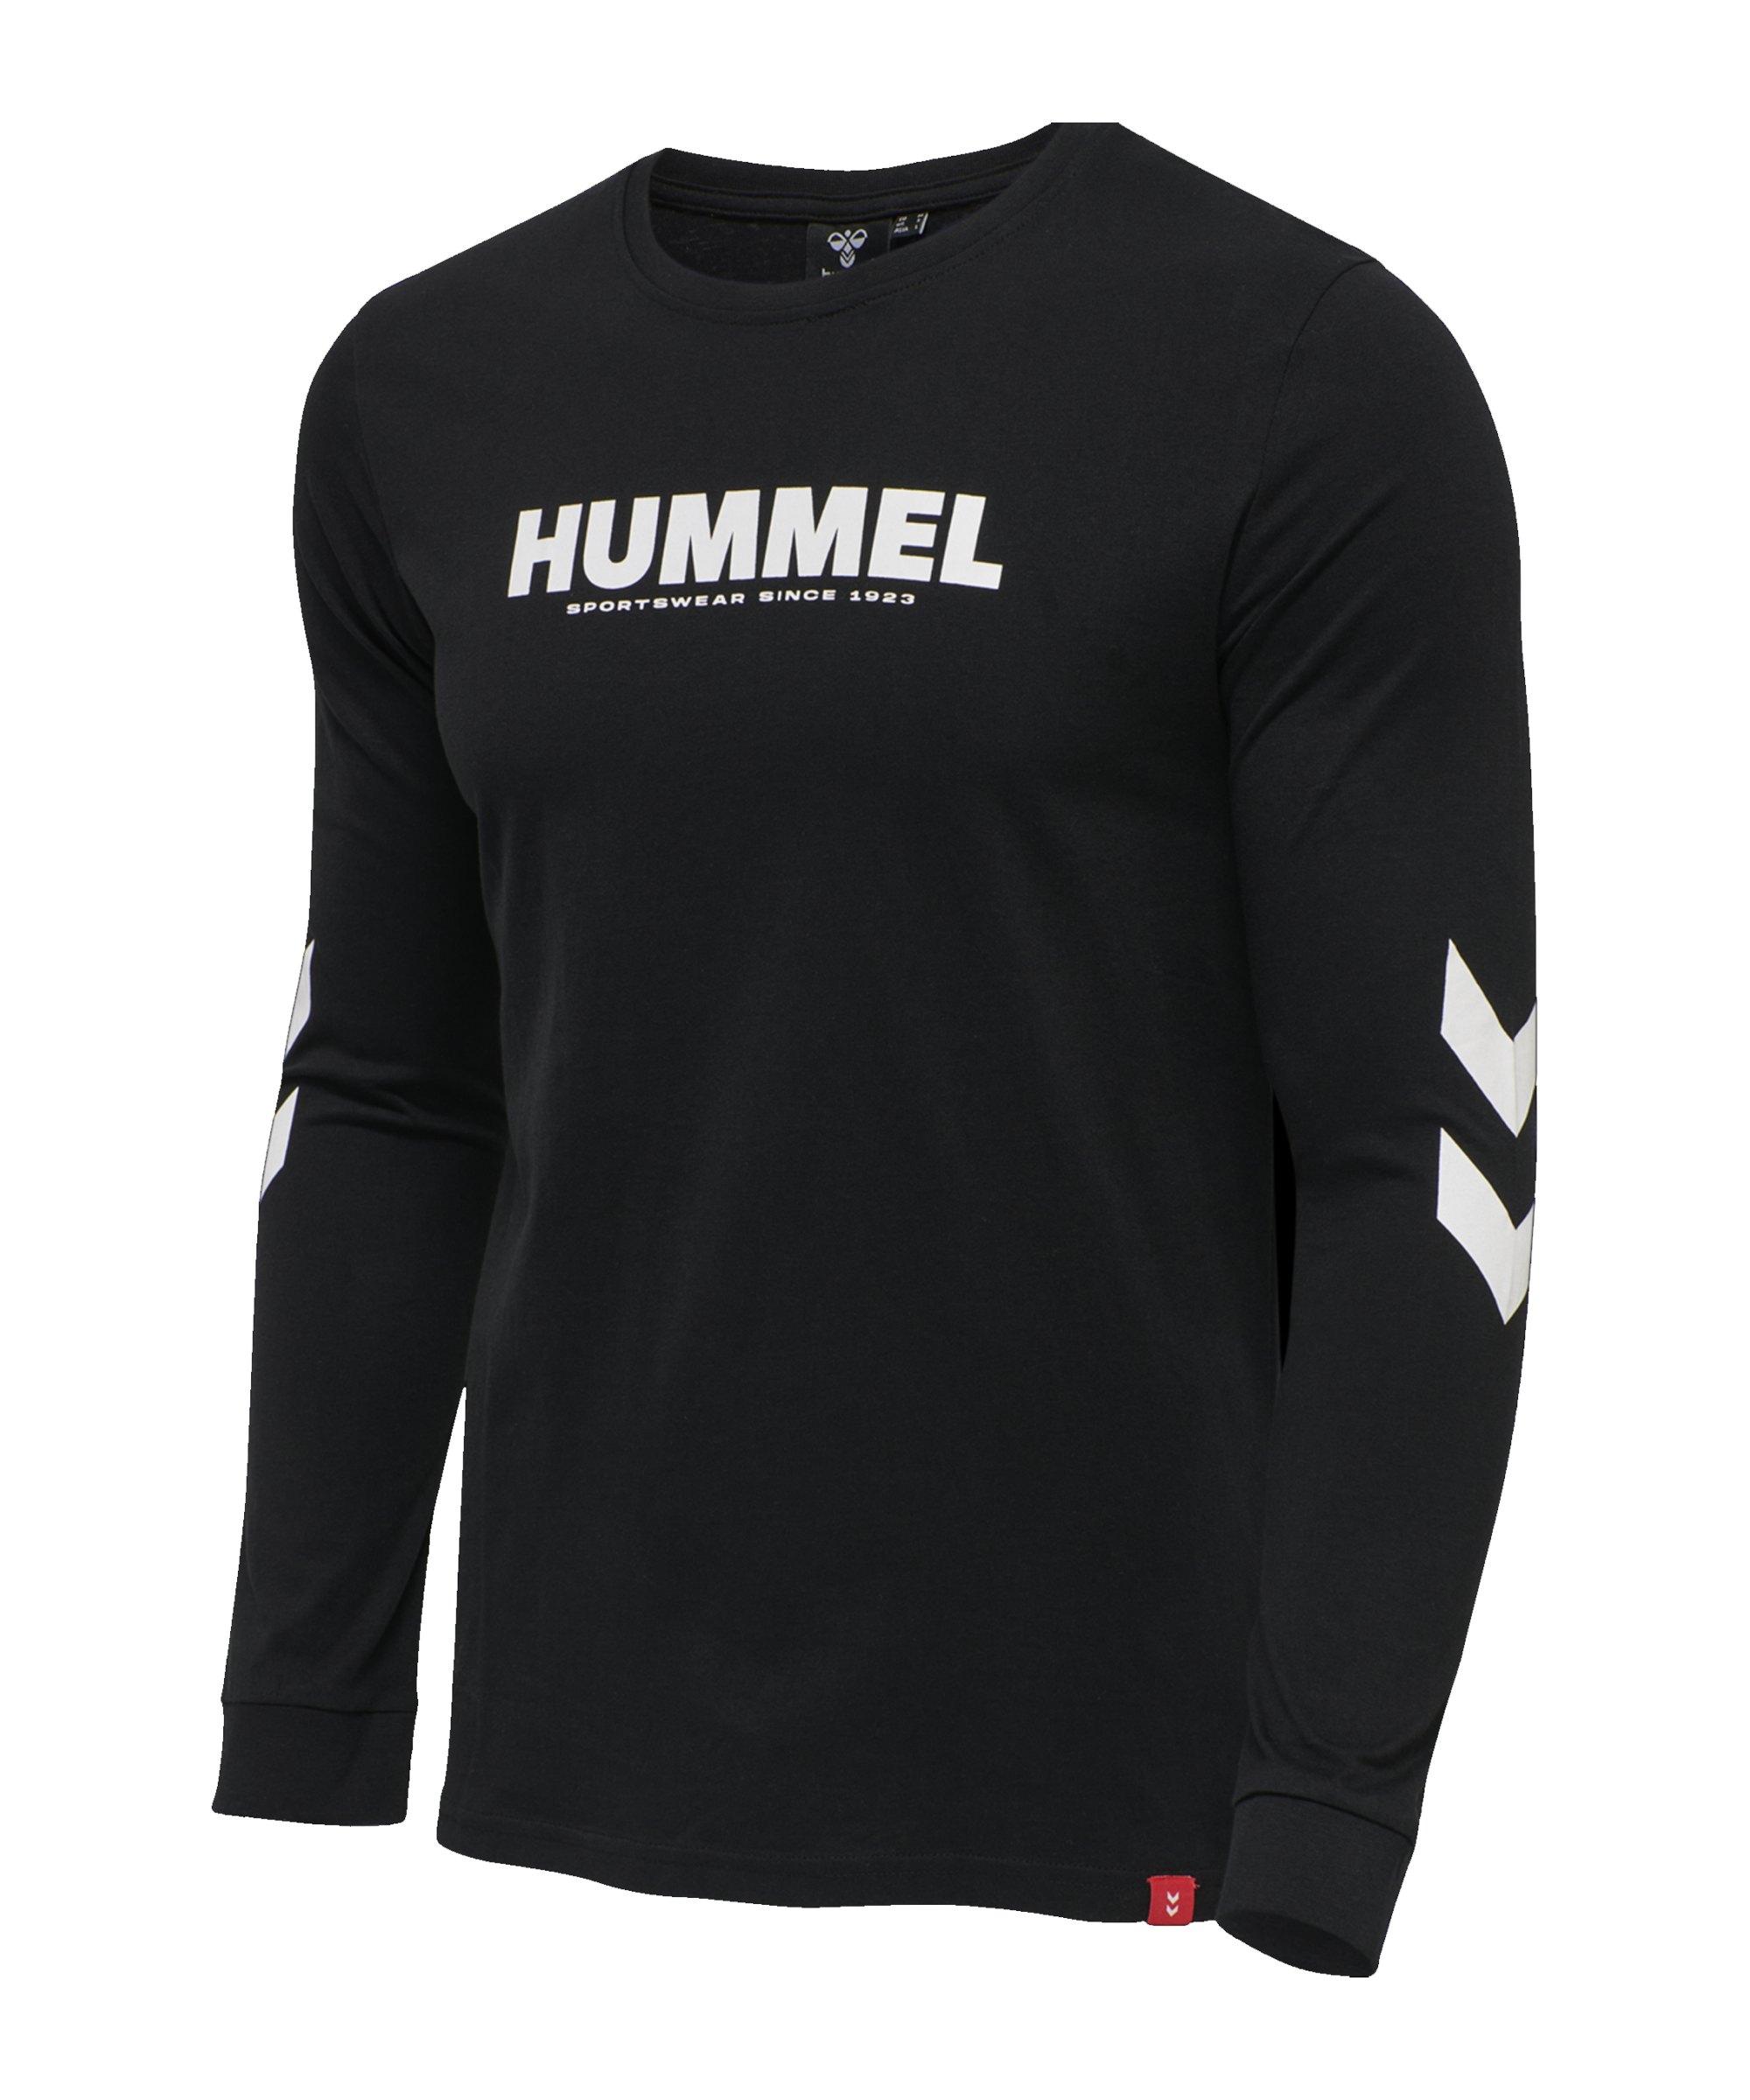 Hummel Legacy Sweatshirt Schwarz F2001 - schwarz